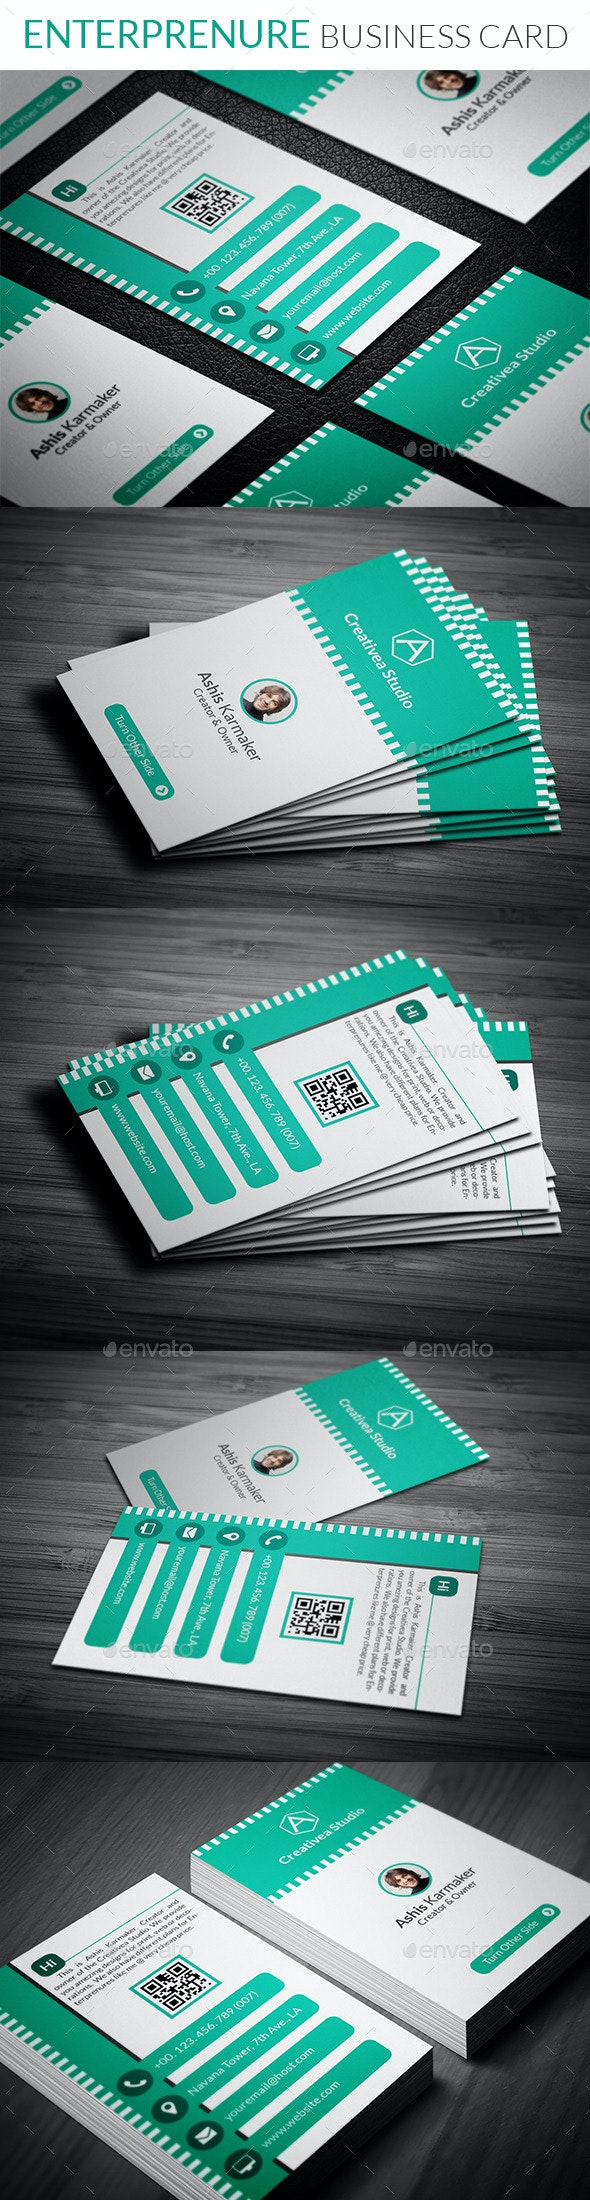 Entrepreneur Business Card - Creative Business Cards